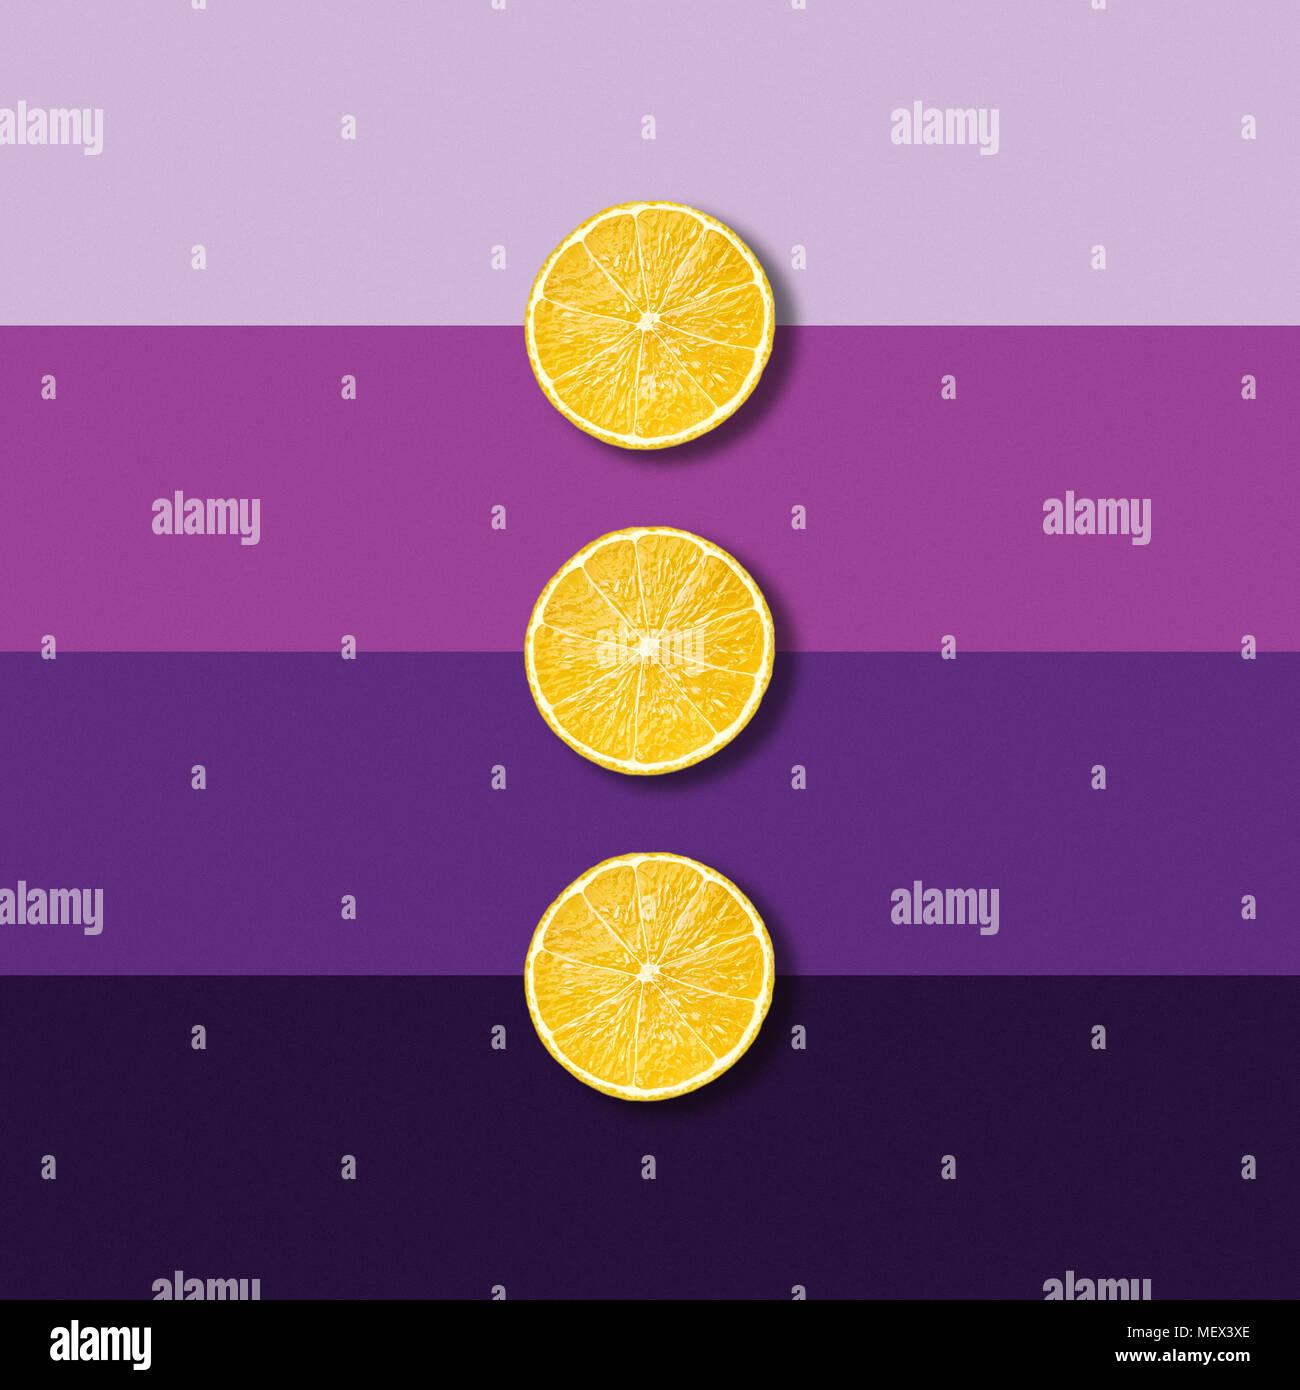 Tres rebanadas de fruta de limón en púrpura eléctrico fondo abstracto, pop art foto Imagen De Stock